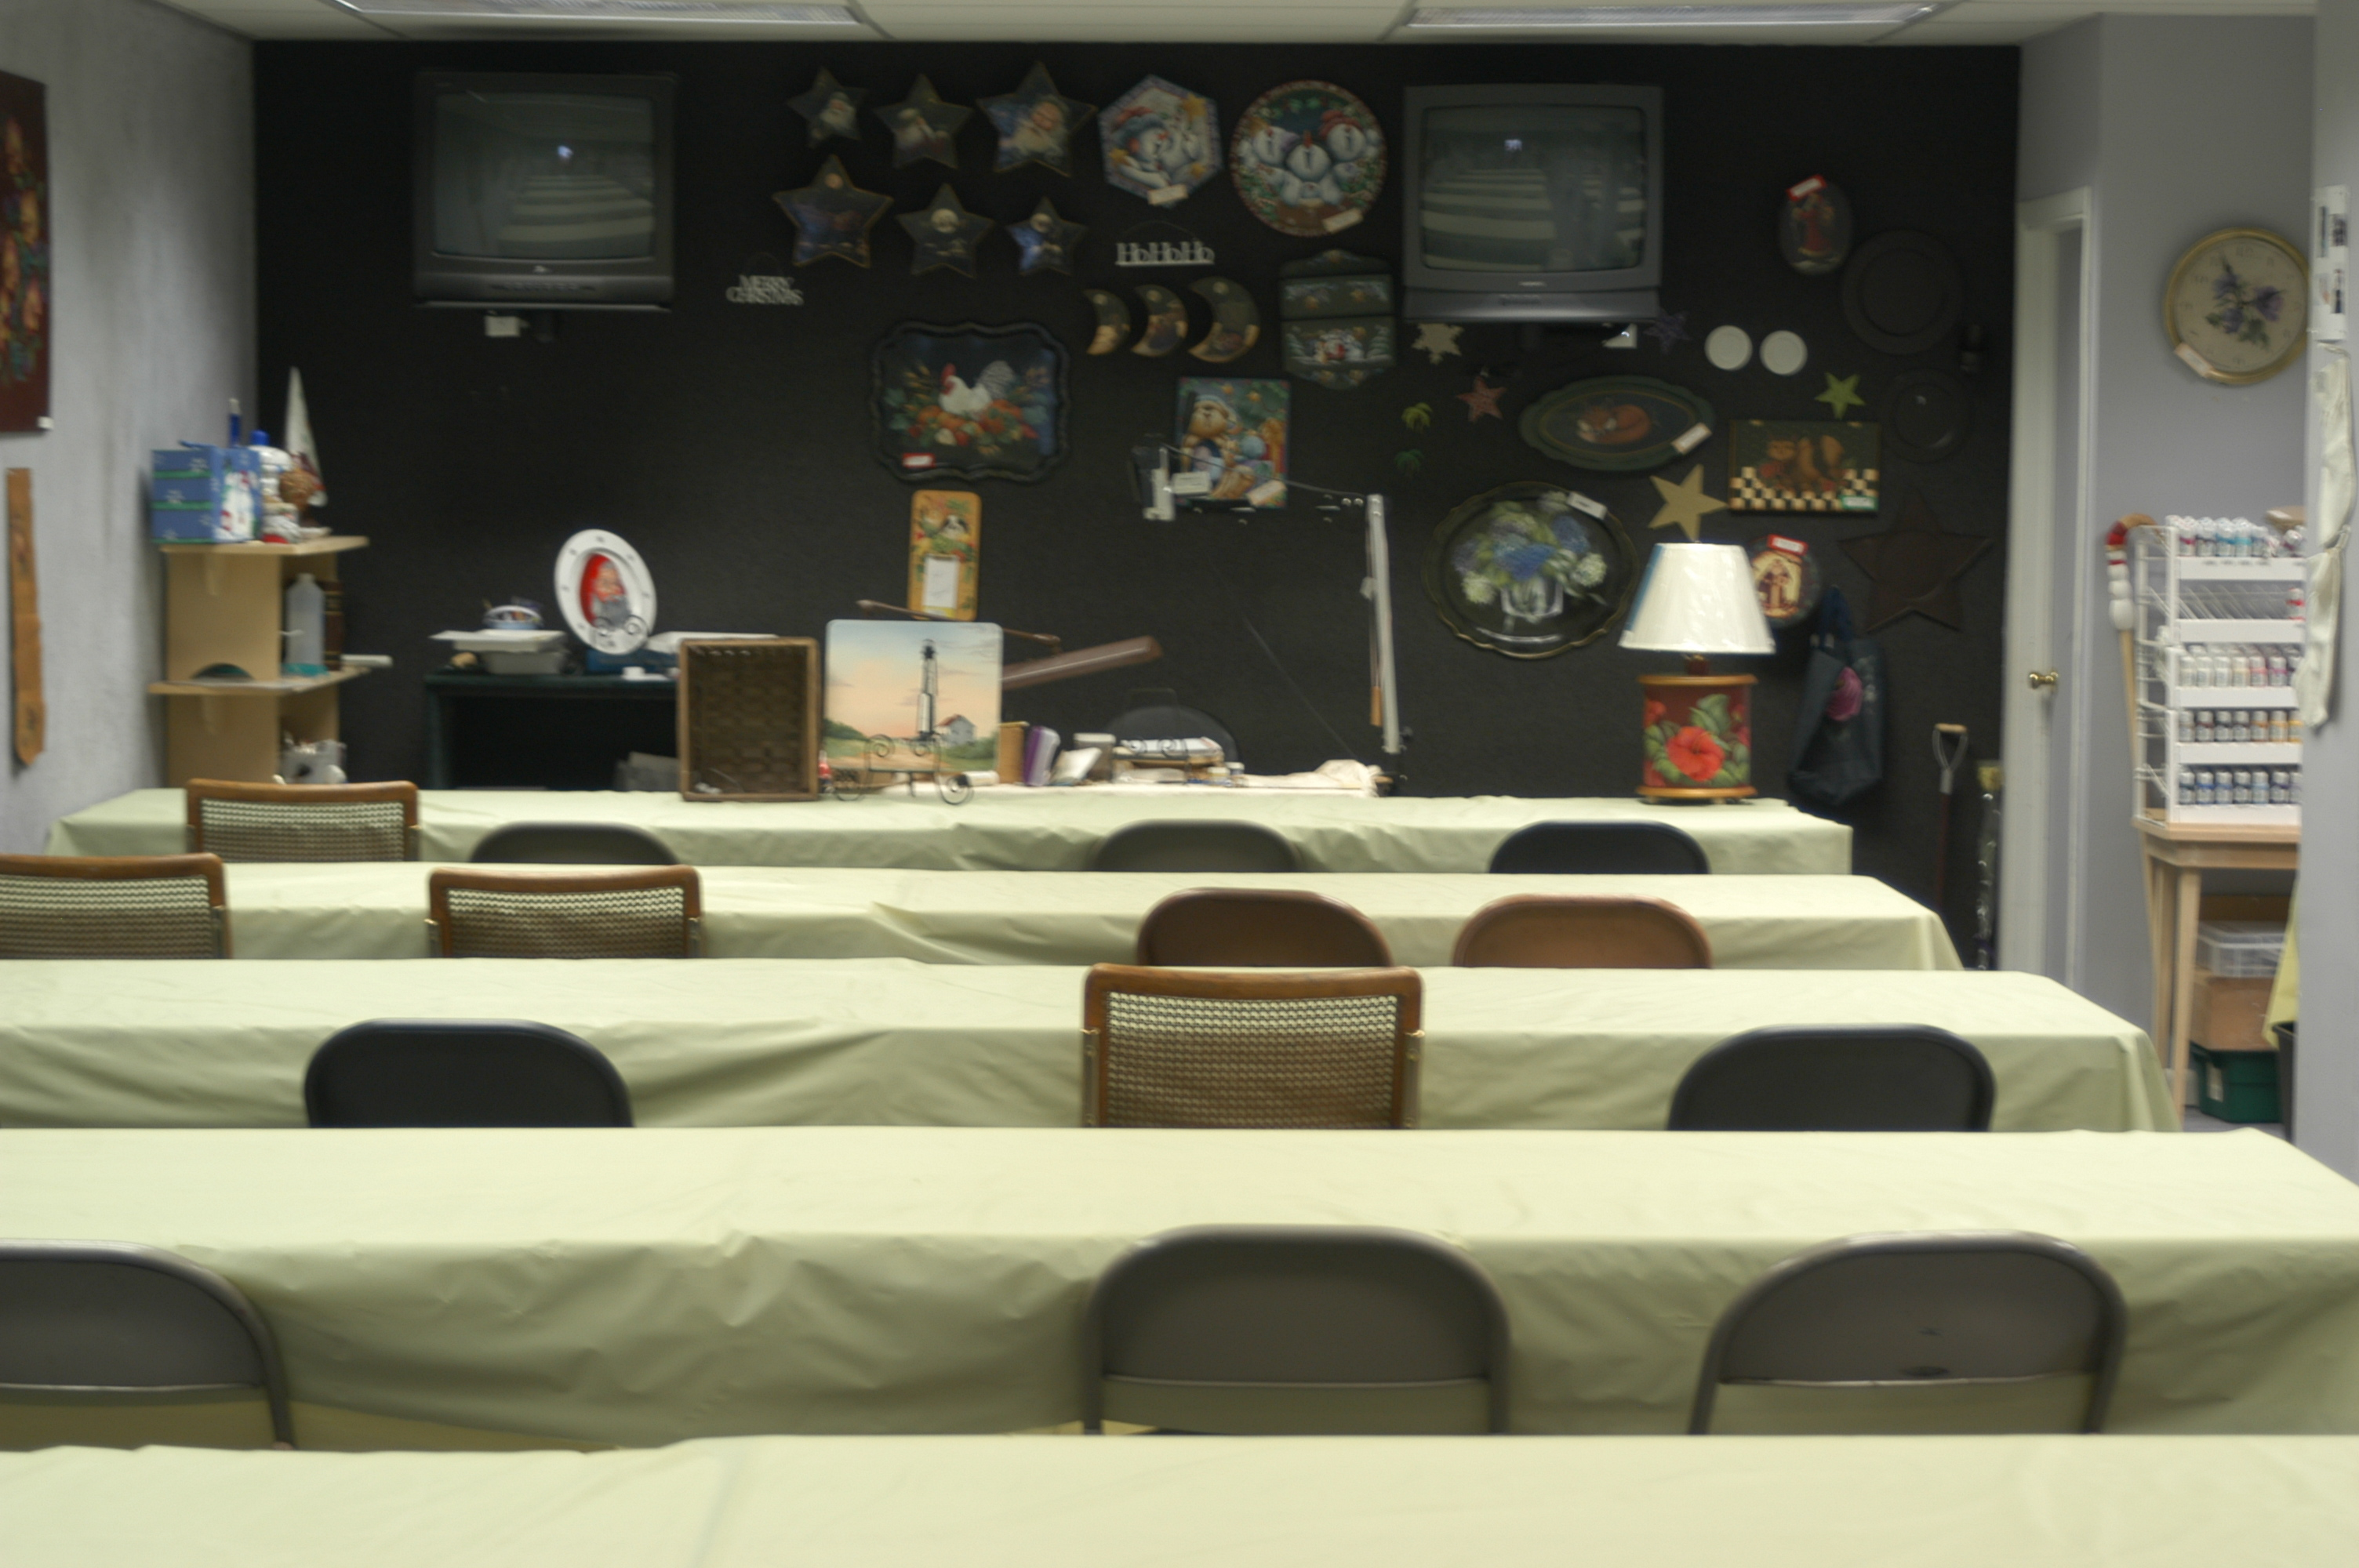 painters-paradise-classroom-19-.jpg